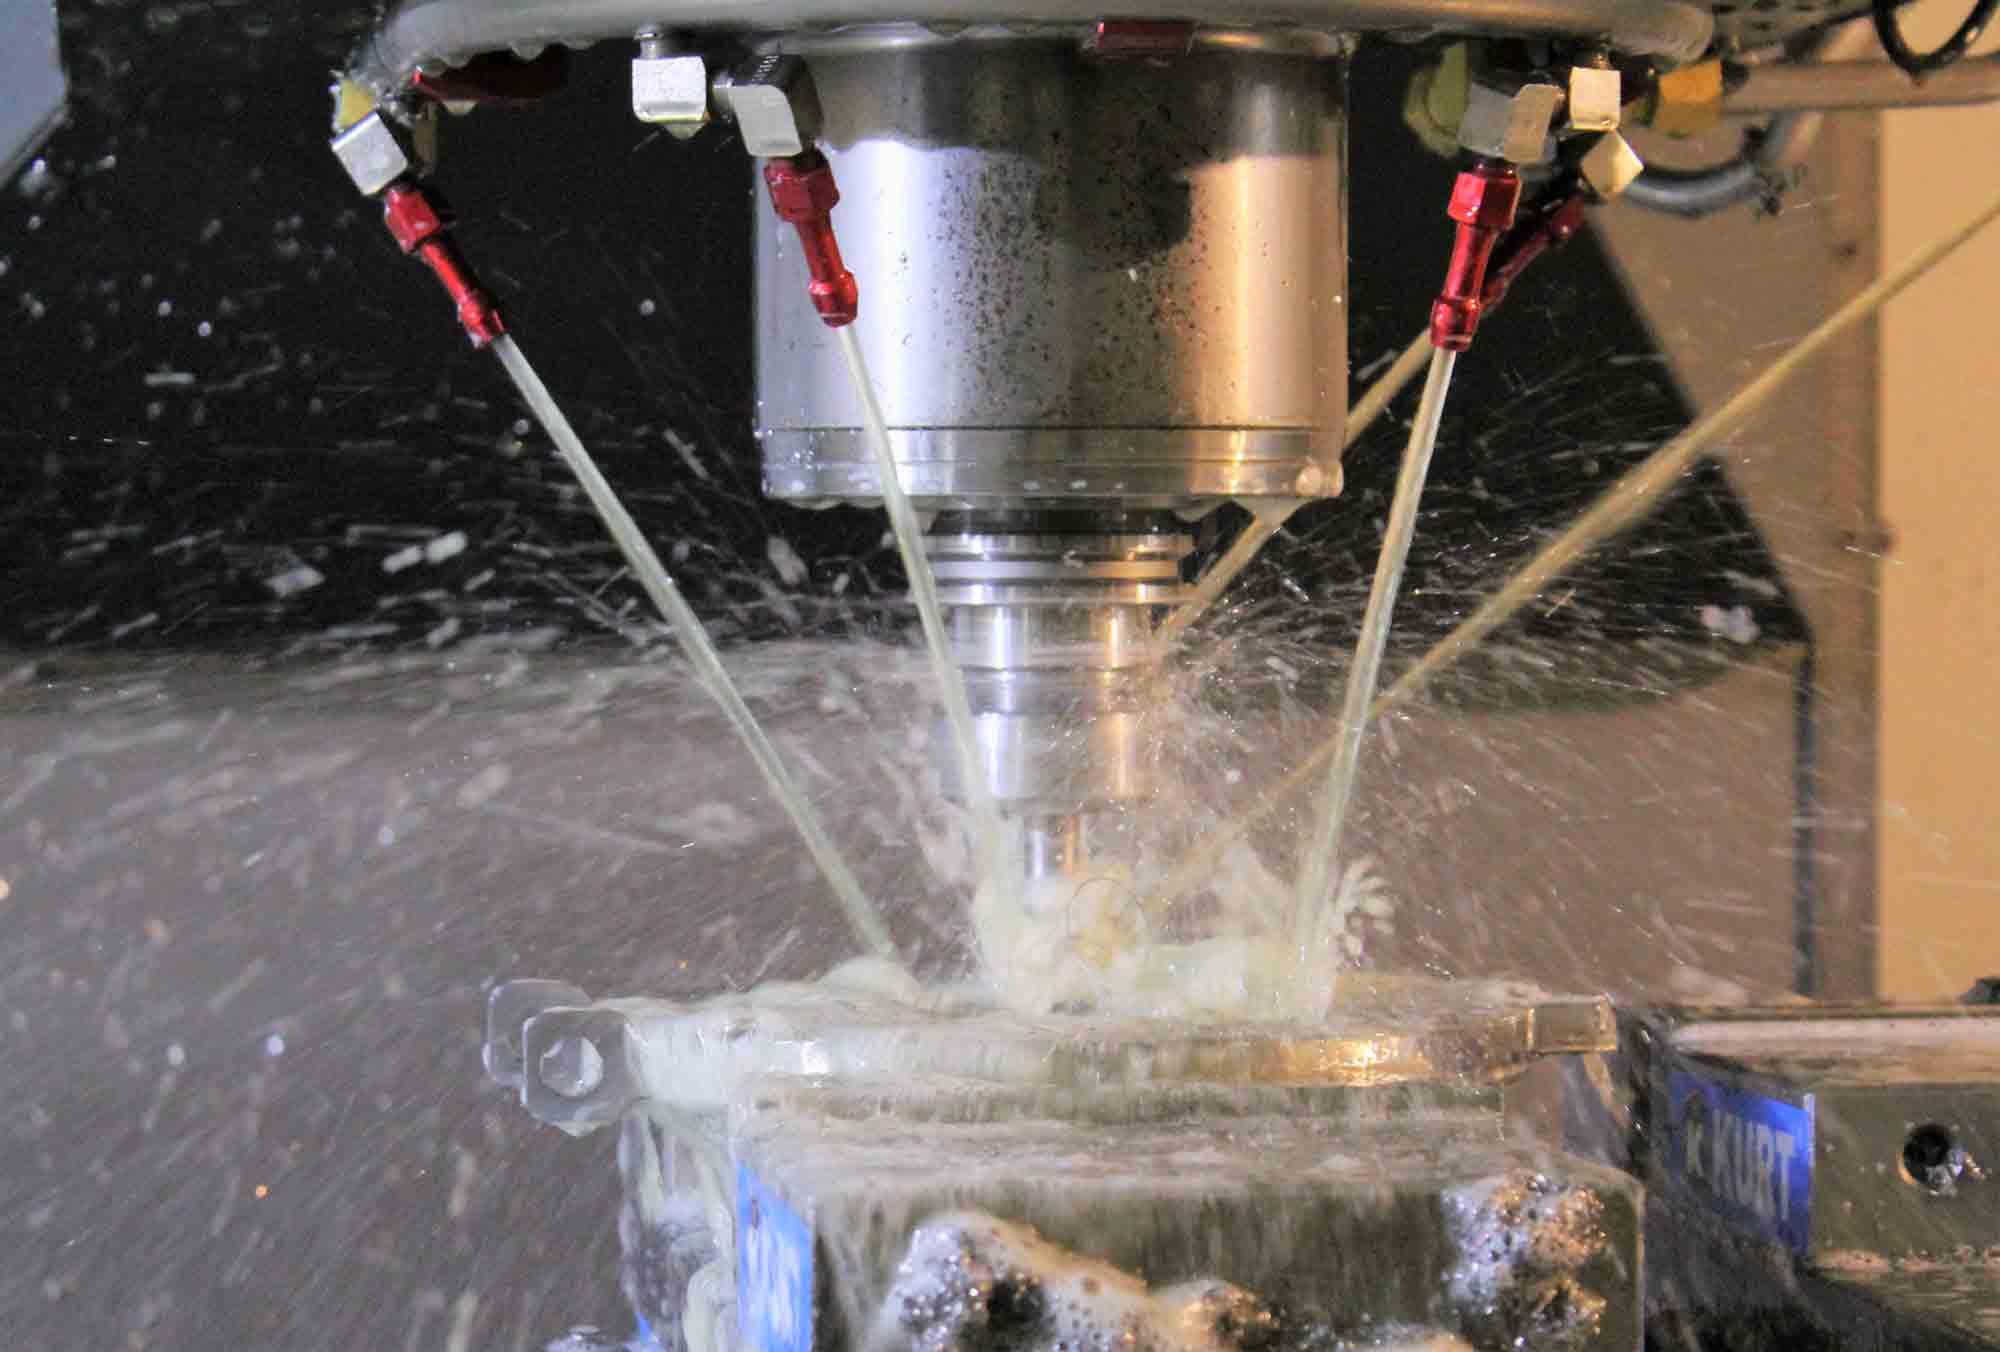 VTI CNC Milling - Coolant On & Machine Running